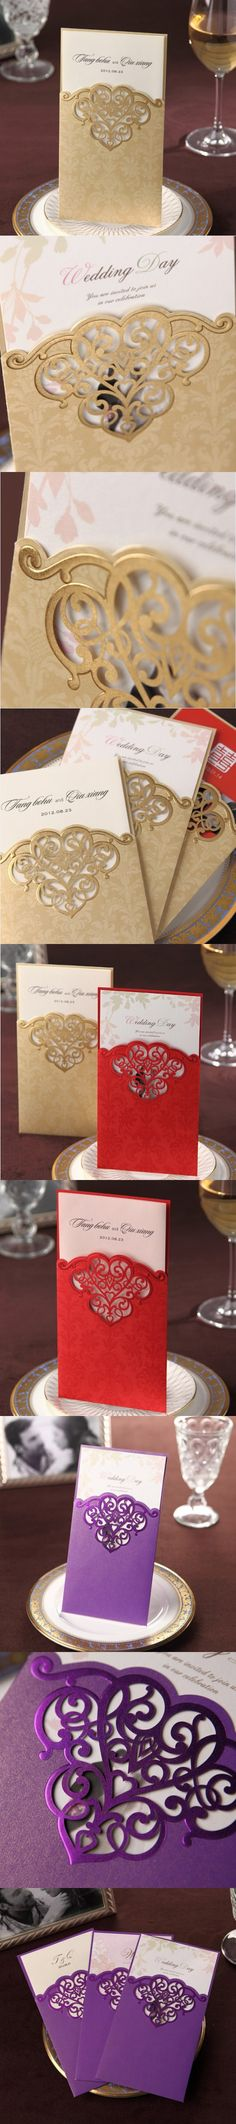 Lovely gold laser cut embossed invitation VC0006G